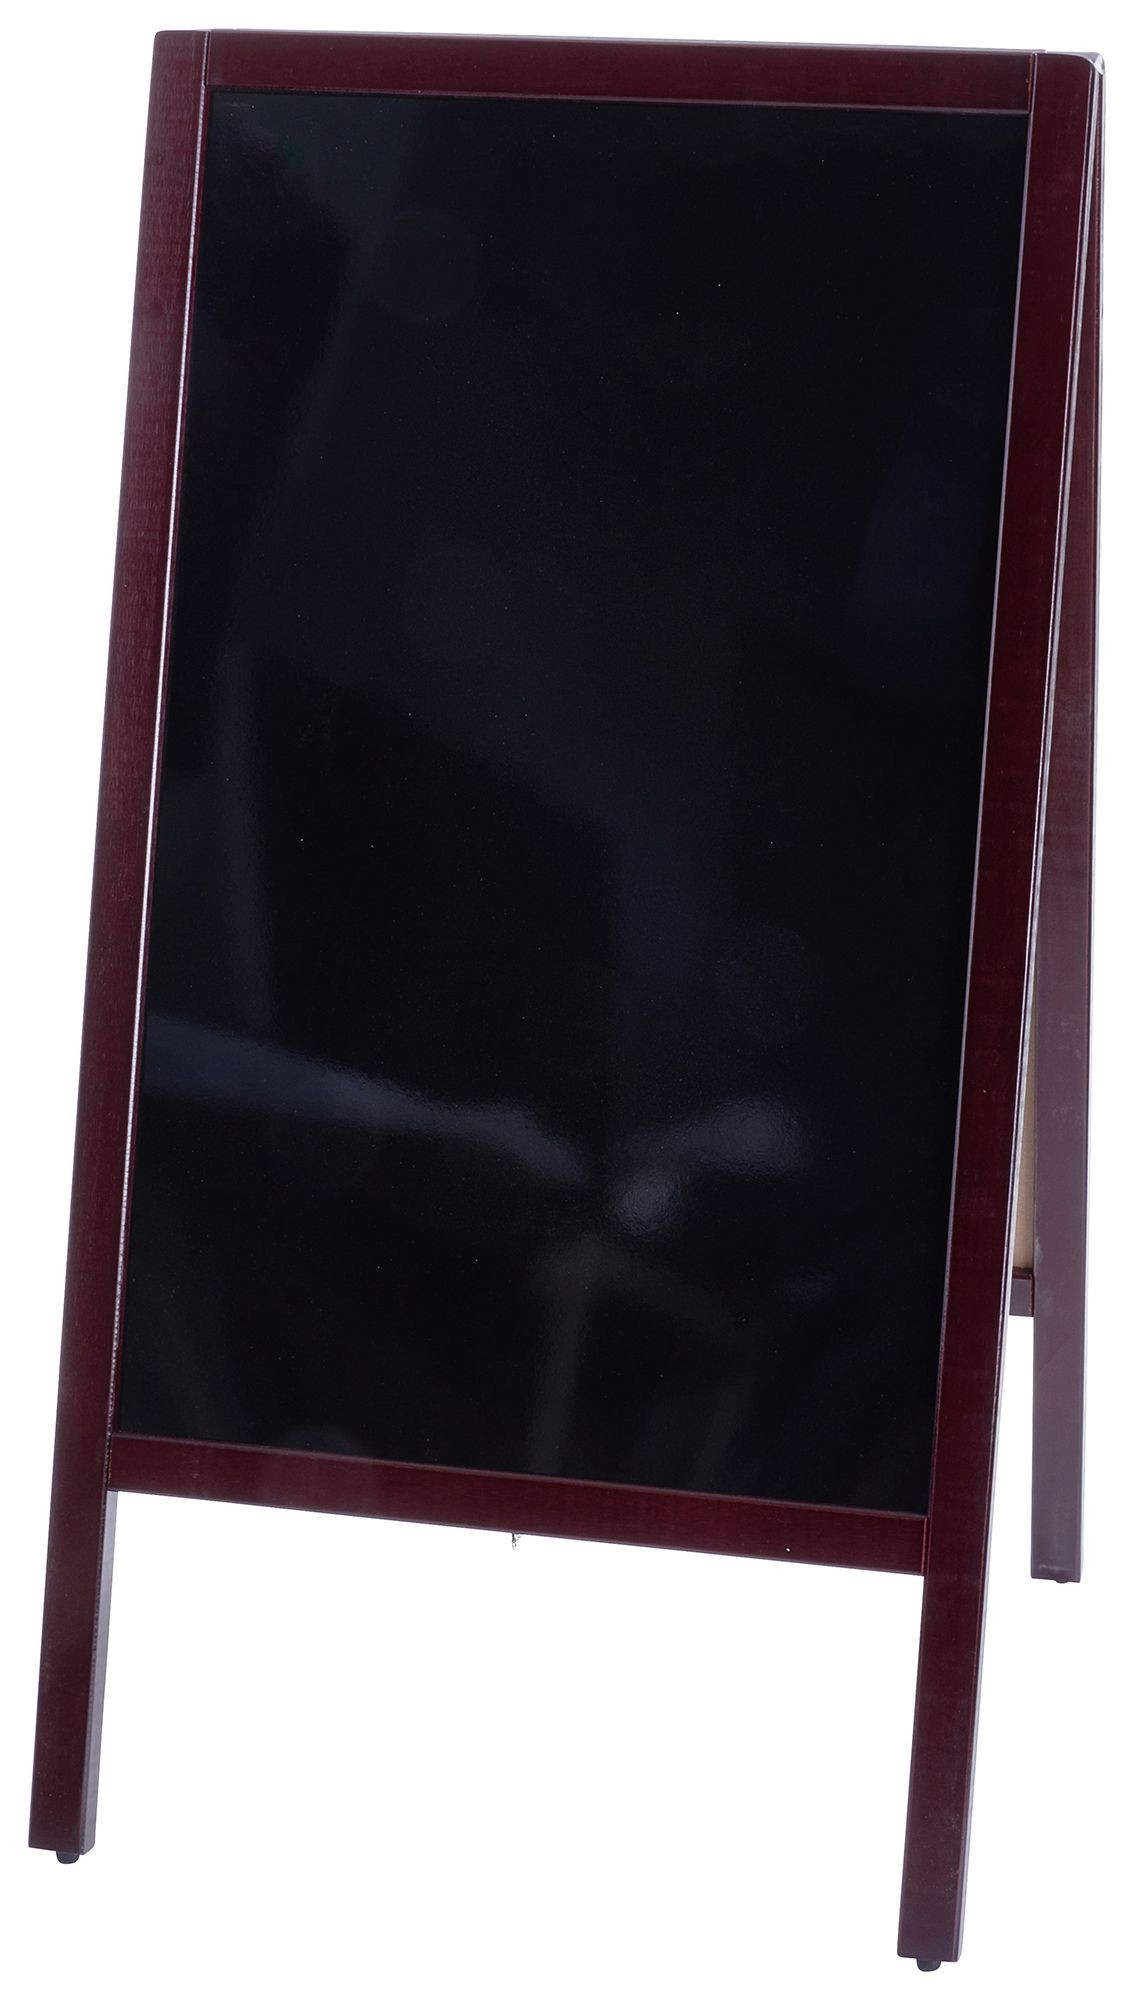 "Winco MBAF-3 Sidewalk A-Frame Marker Board Set, Mahogany Finish 20-1/4"" x 39-1/2"""